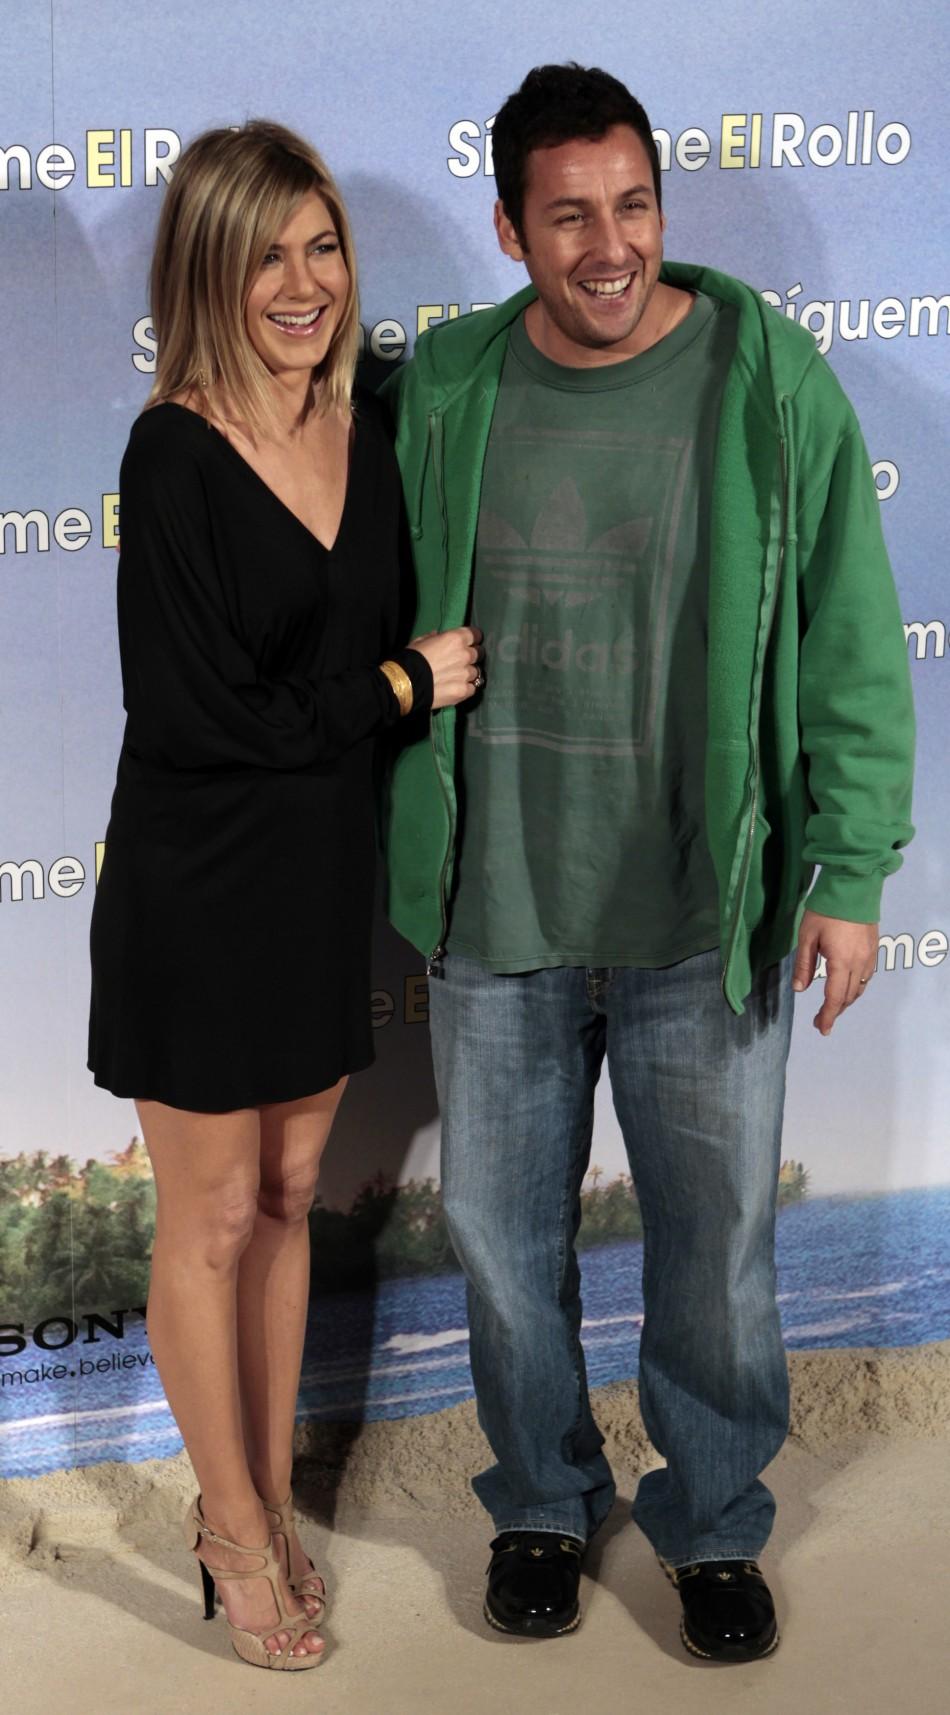 Adam sandler jennifer aniston movies list / Le film egyptien